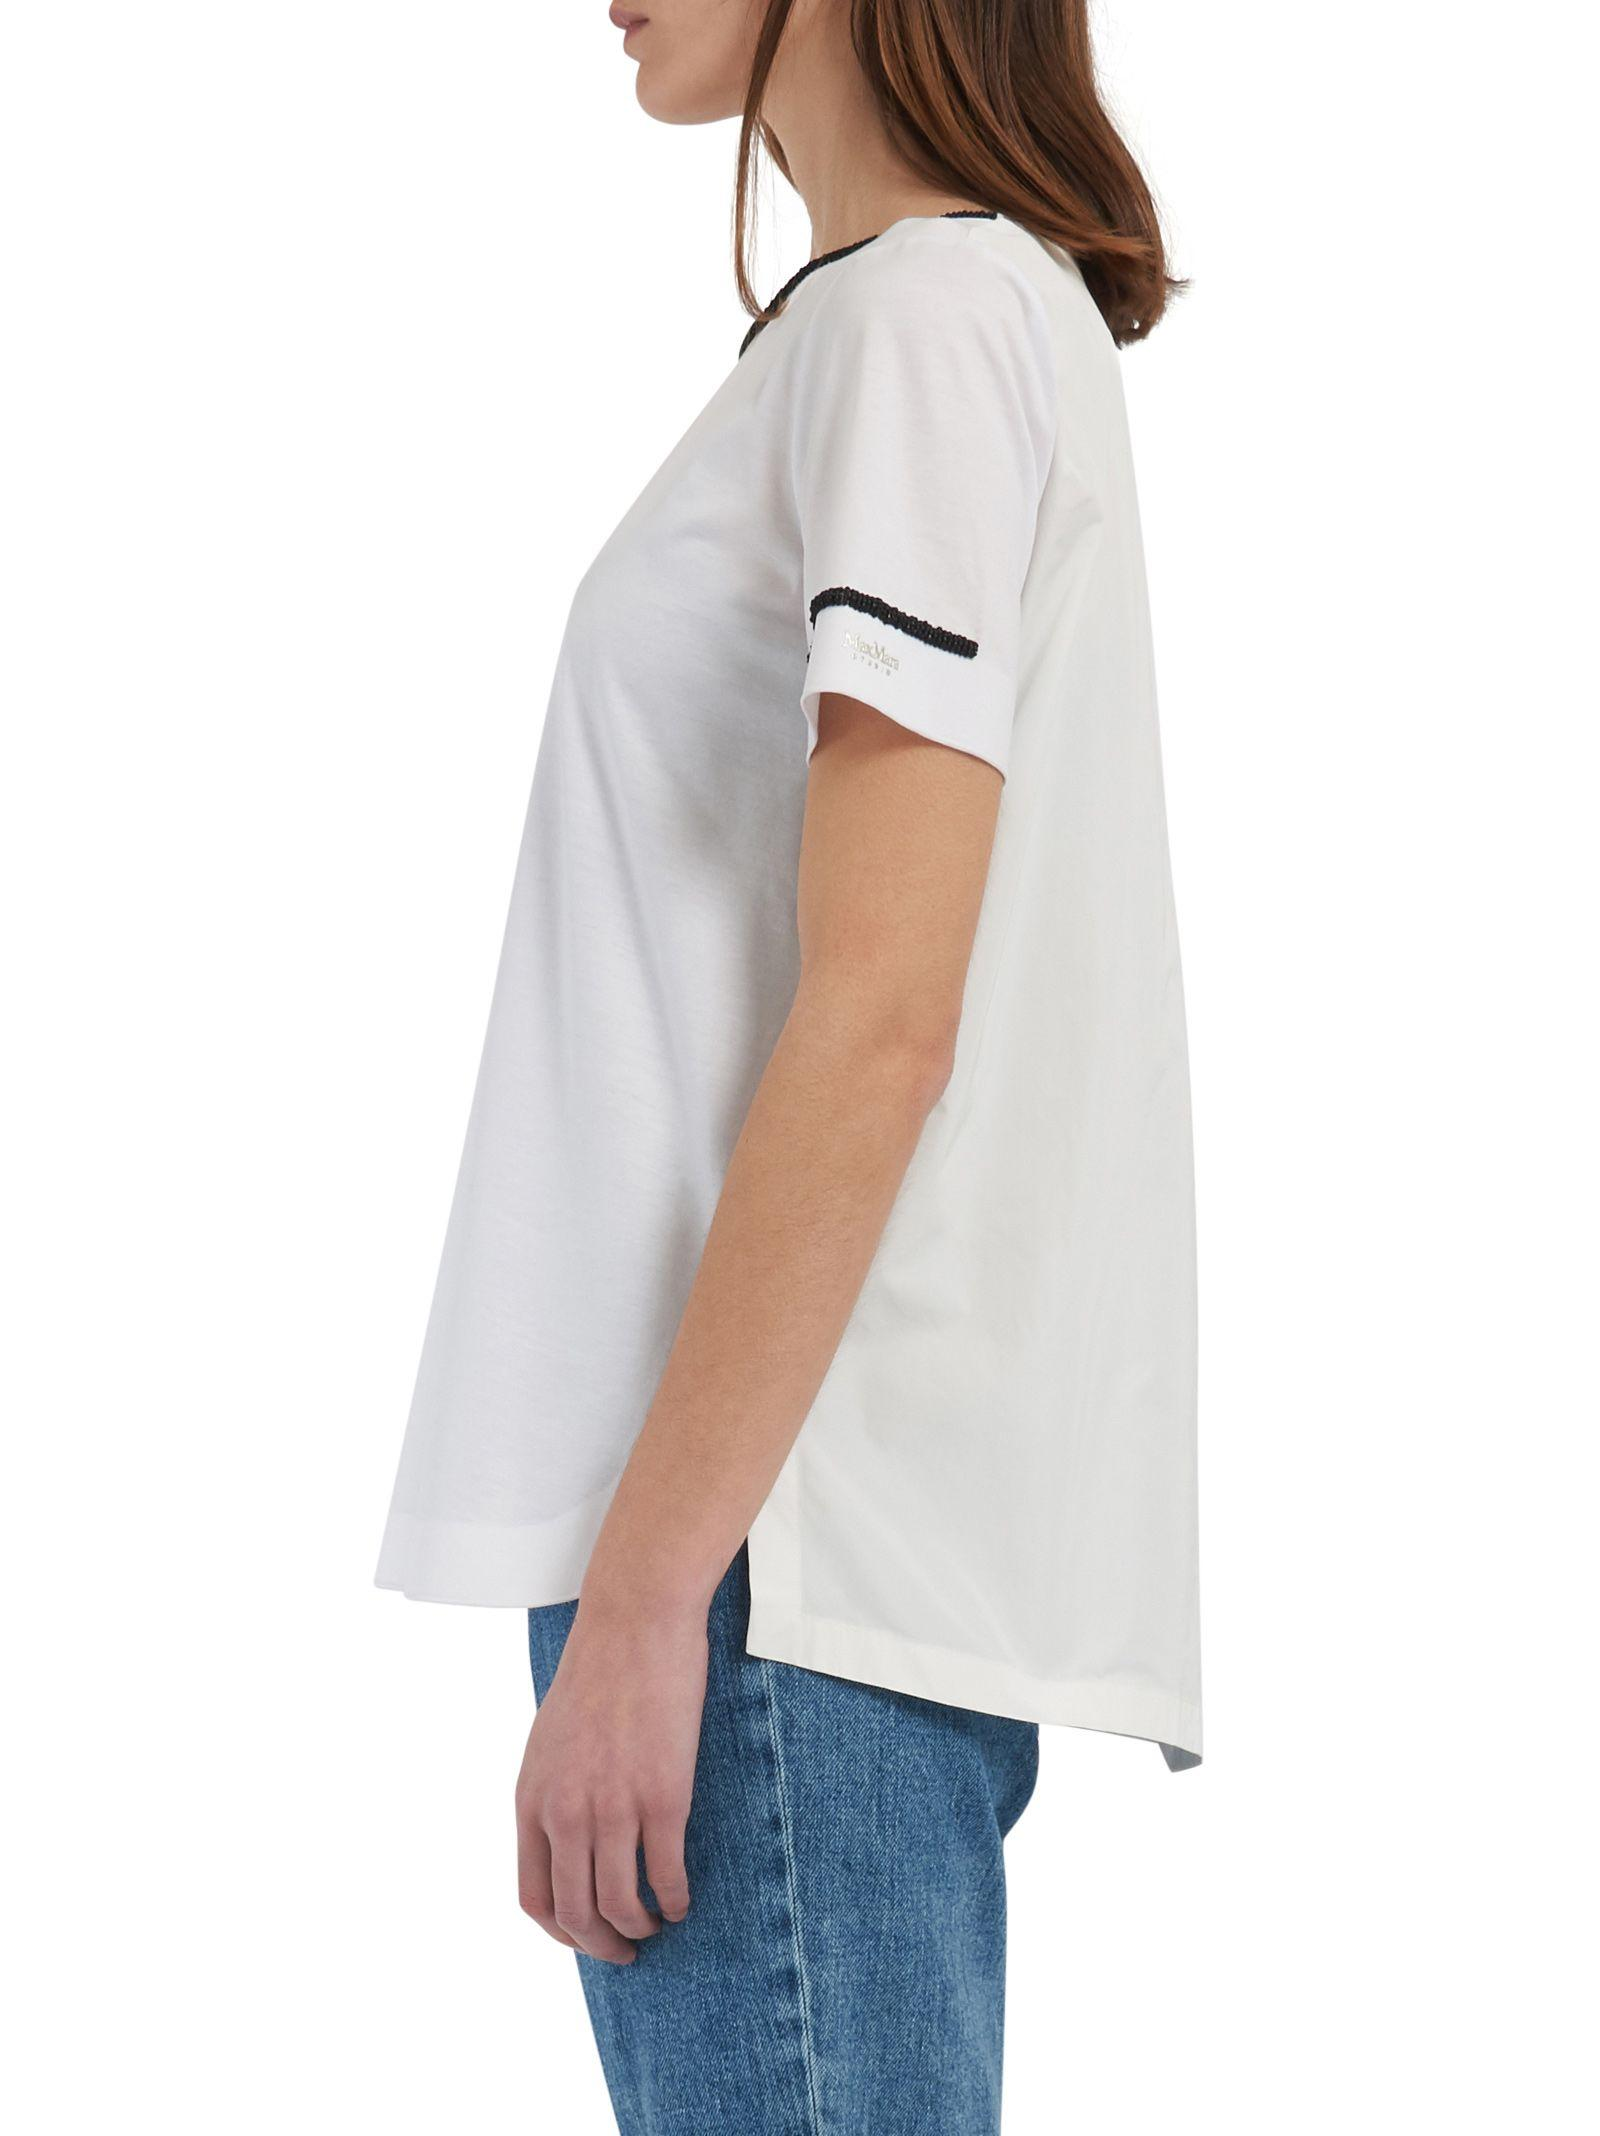 Max Mara Maxmara Studio T-shirt In White